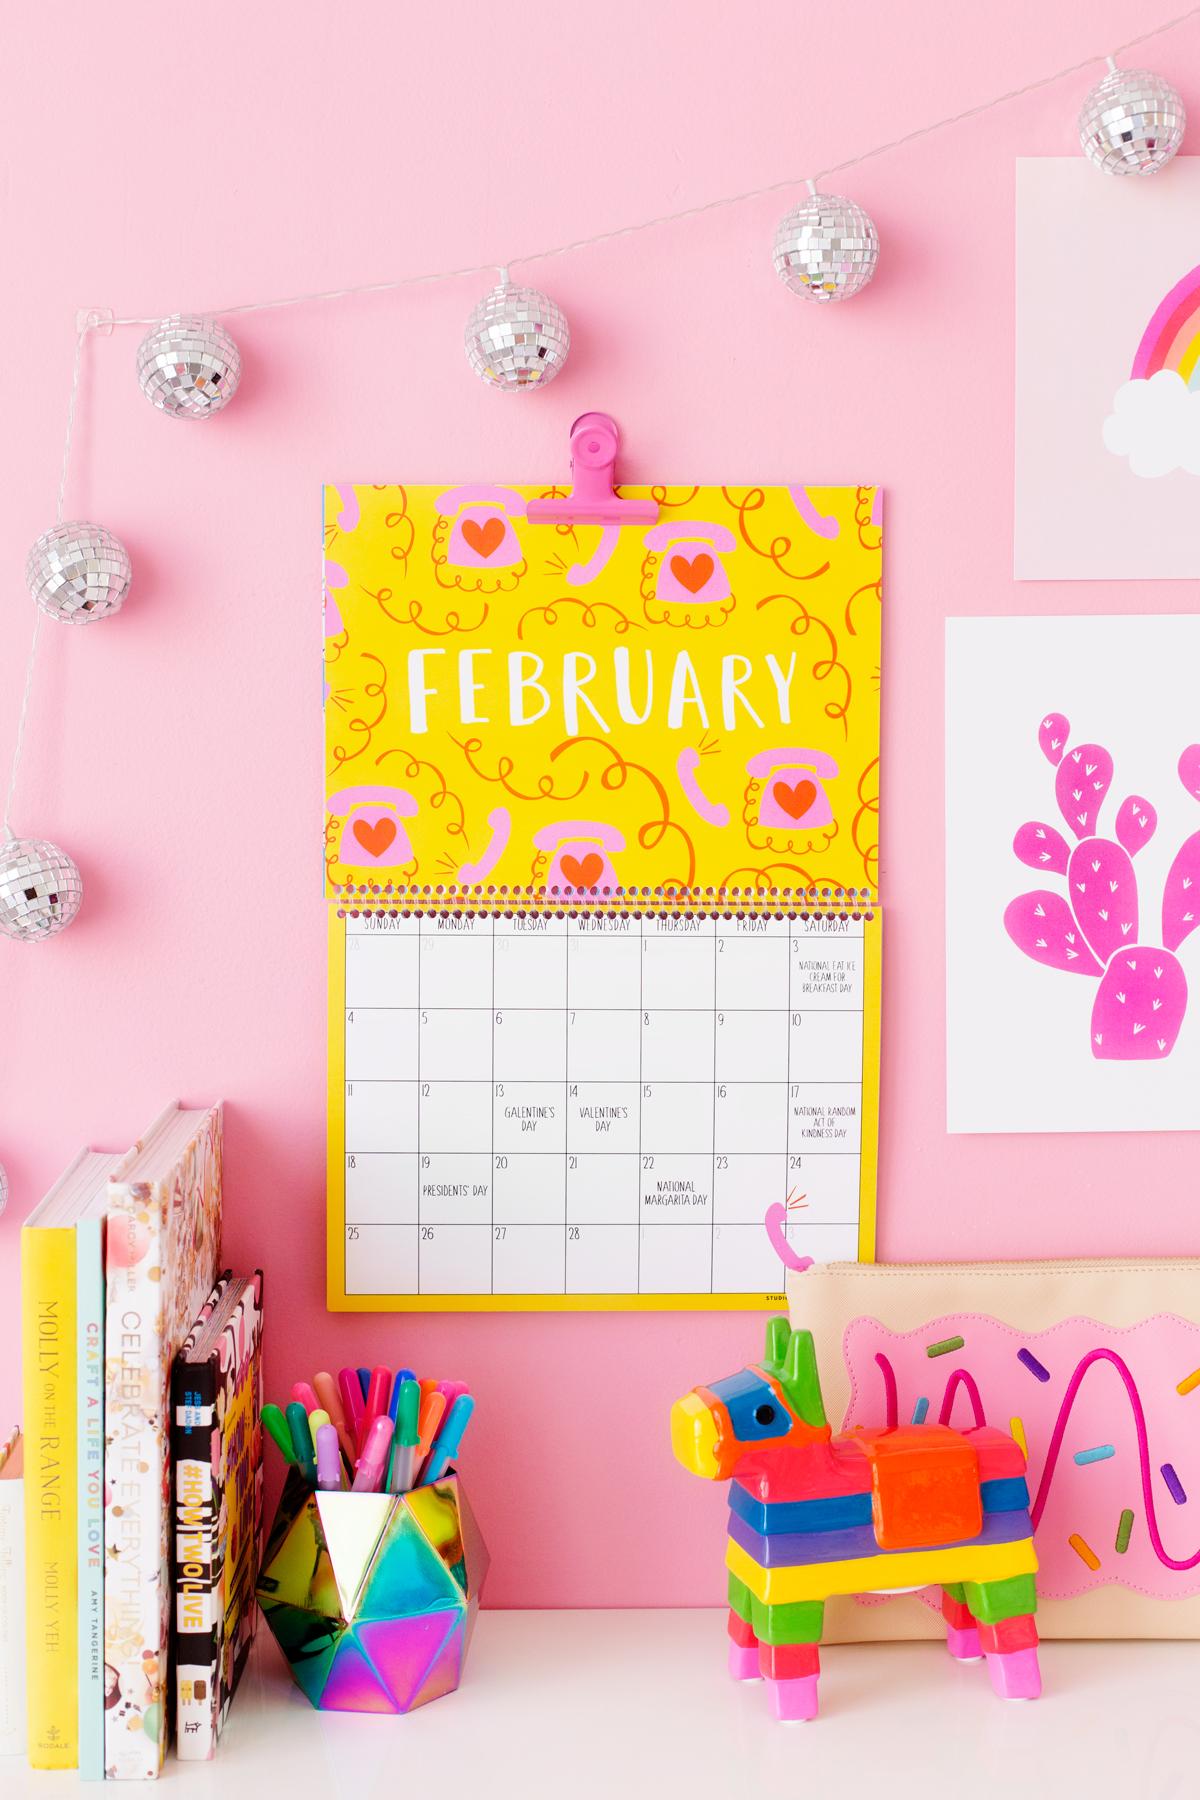 2018 Free Printable Wall Calendar - Studio DIY